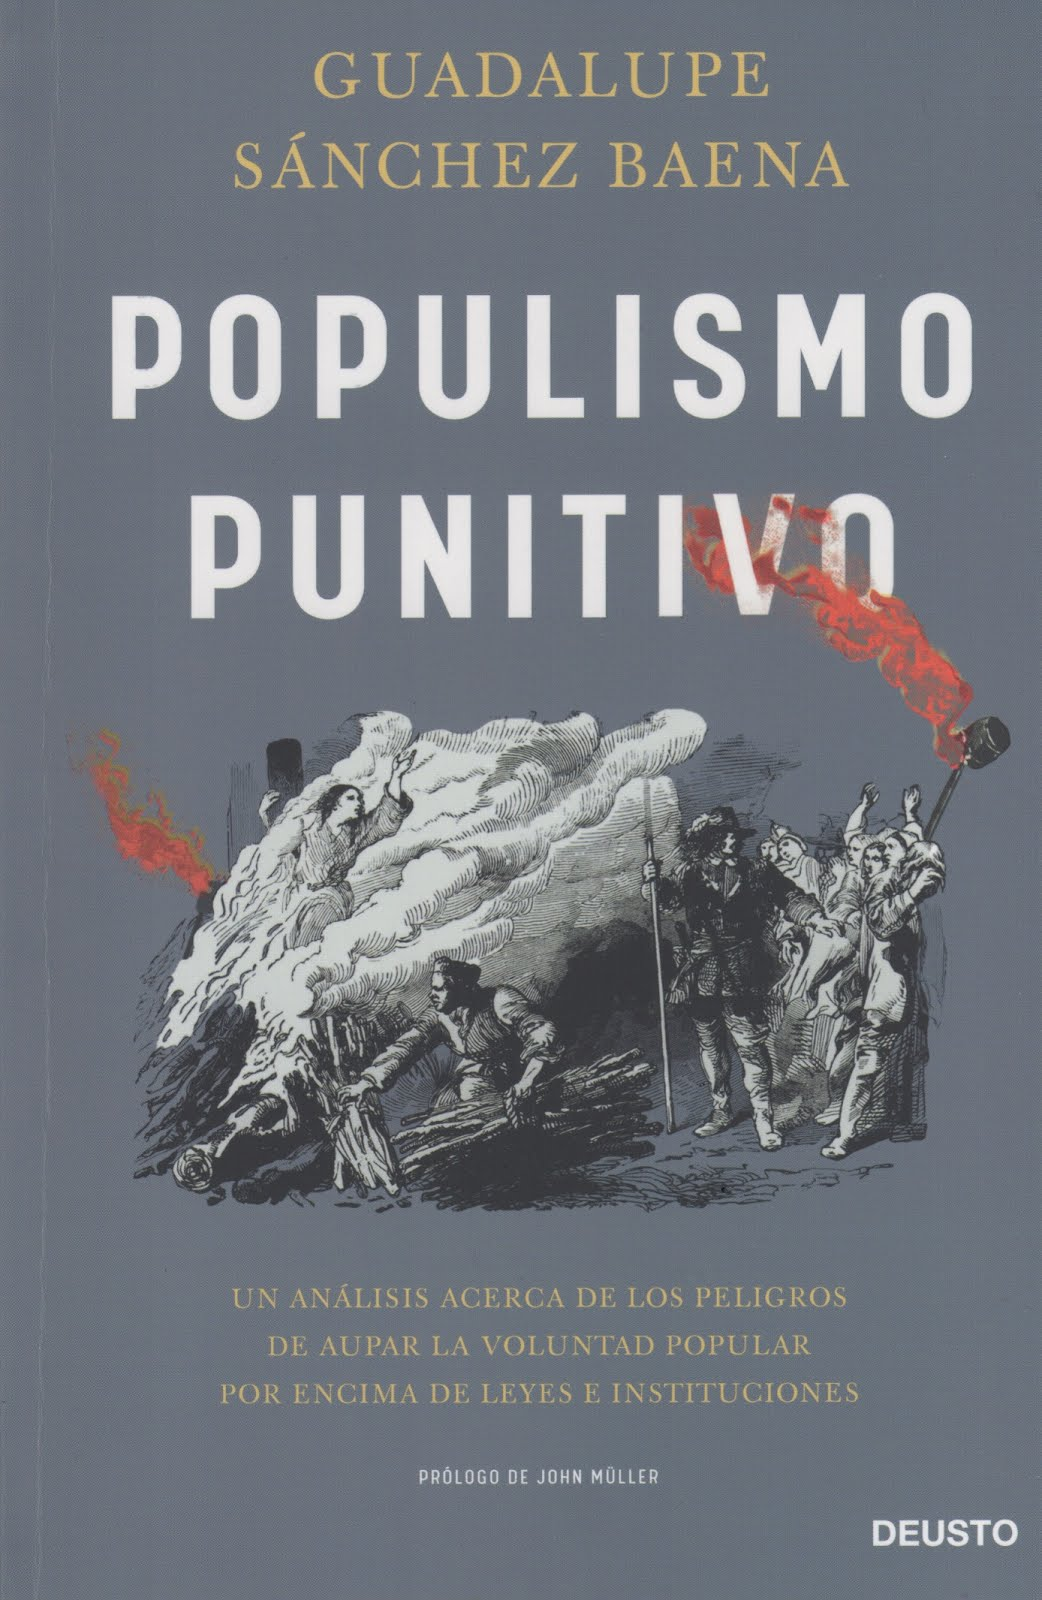 Guadalupe Sánchez Baena (Populismo punitivo)